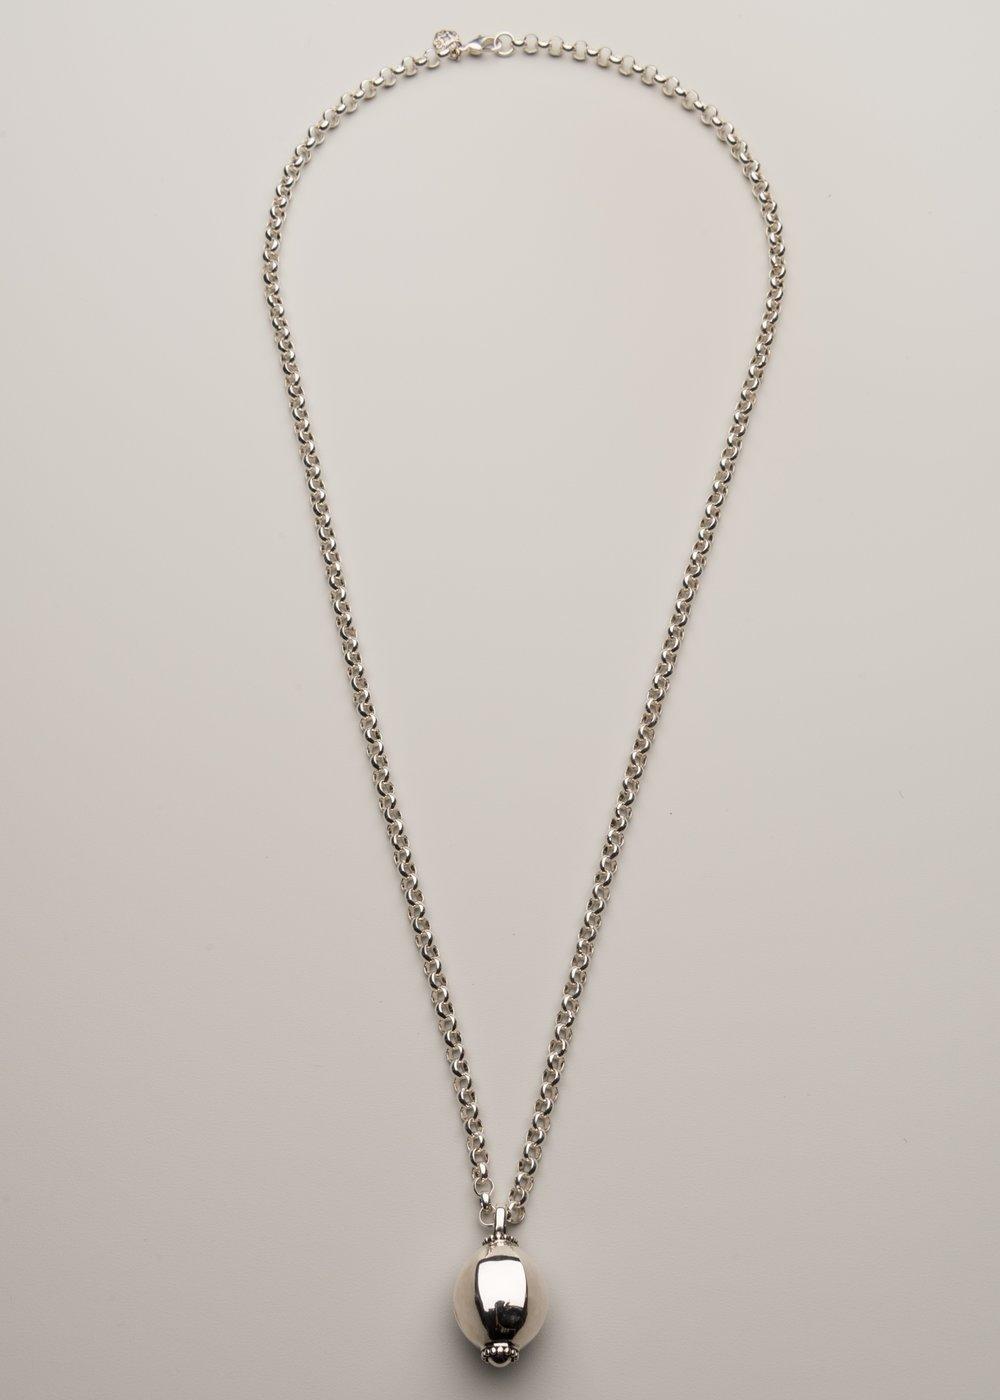 Brigitte regula long necklace with sterling silver ball pendant long necklace with sterling silver ball pendant aloadofball Image collections